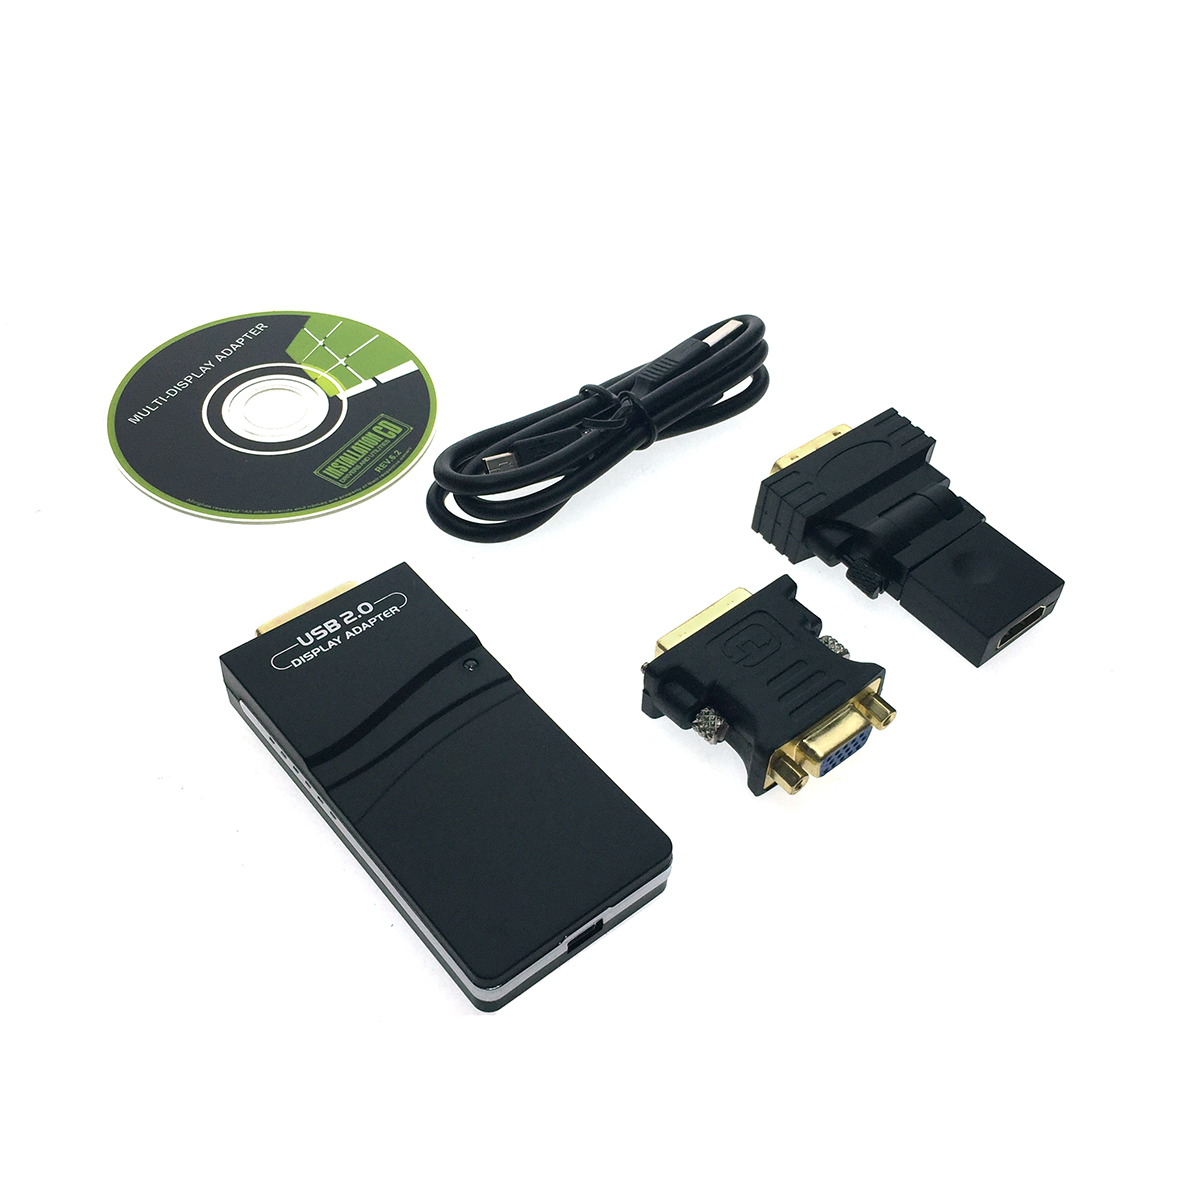 Видеоконвертер USB 2.0 to VGA/HDMI/DVI, Full HD 1080p, H000USB Espada чипсет DisplayLink DL-165